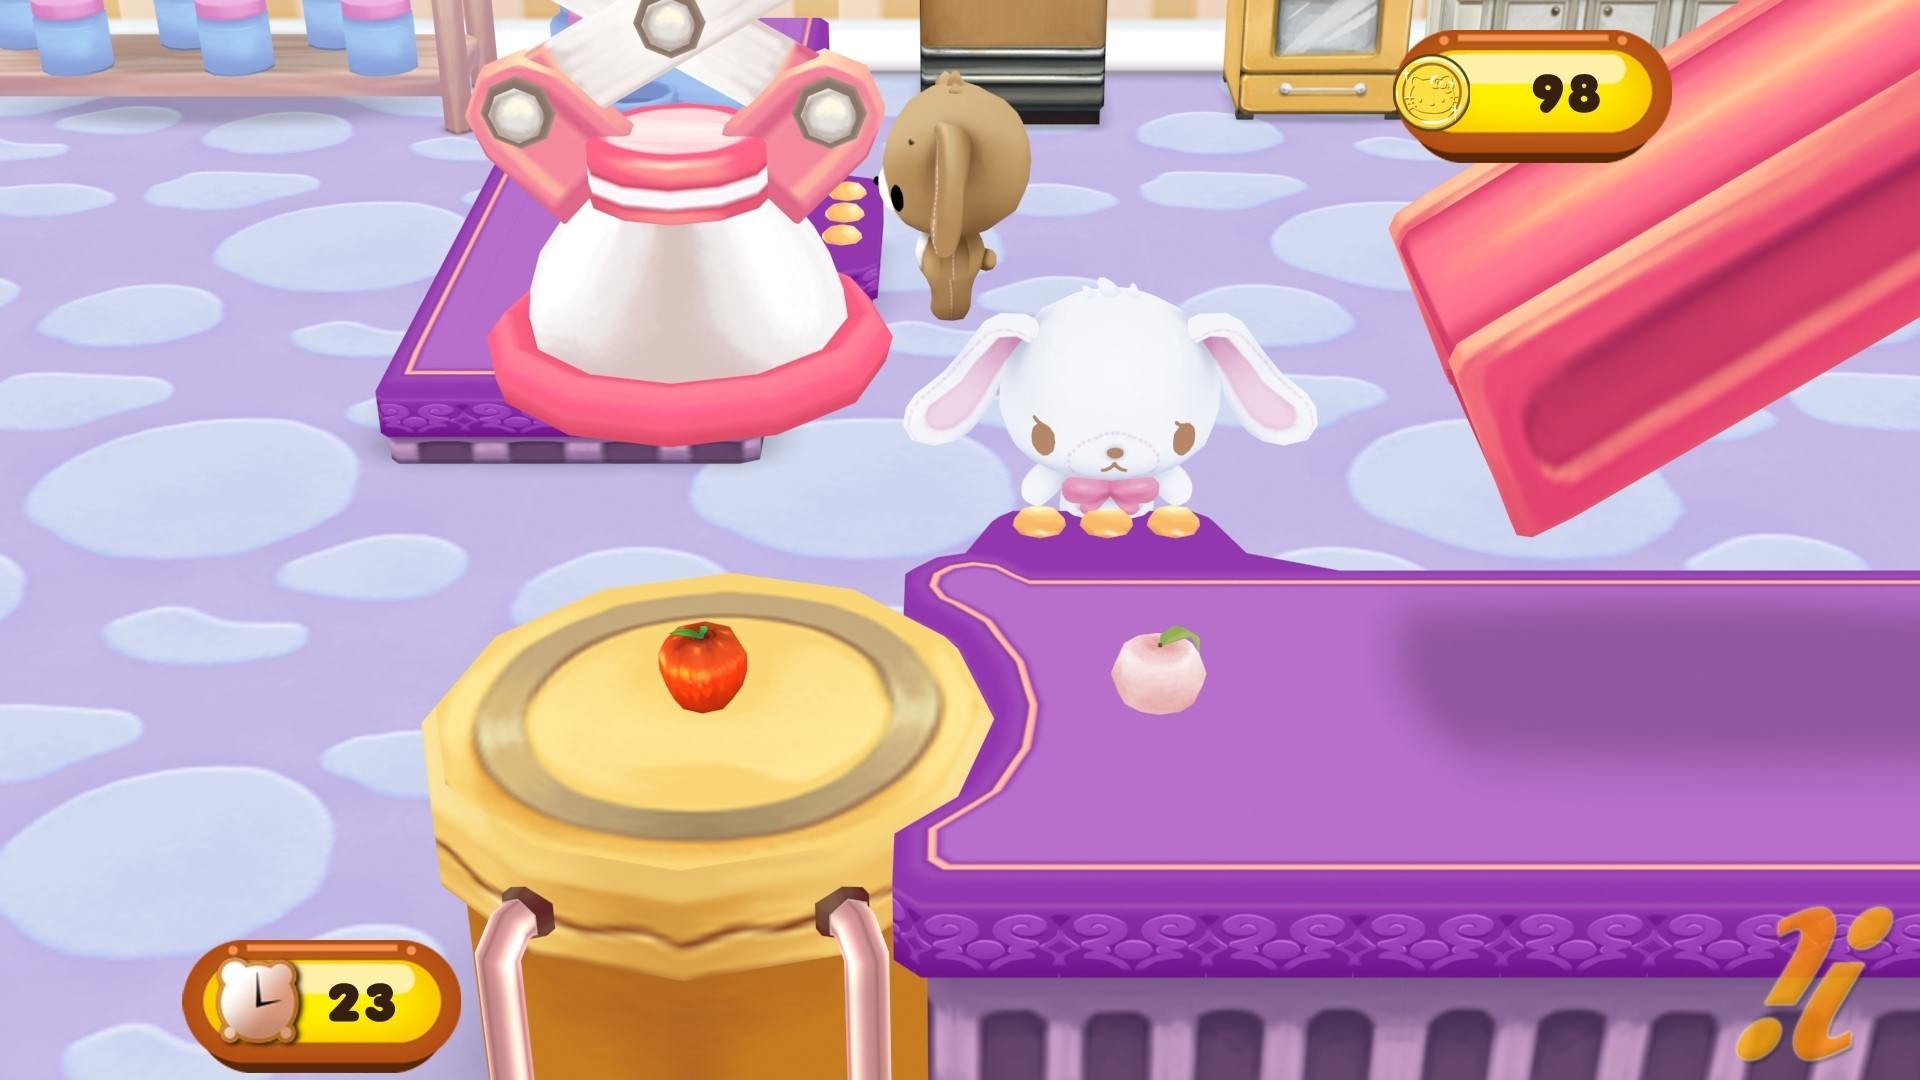 Animal Crossing Search Results Hello Kitty Seasons Nintendo Wii Zone 187259 Wallpaper  wallpaper